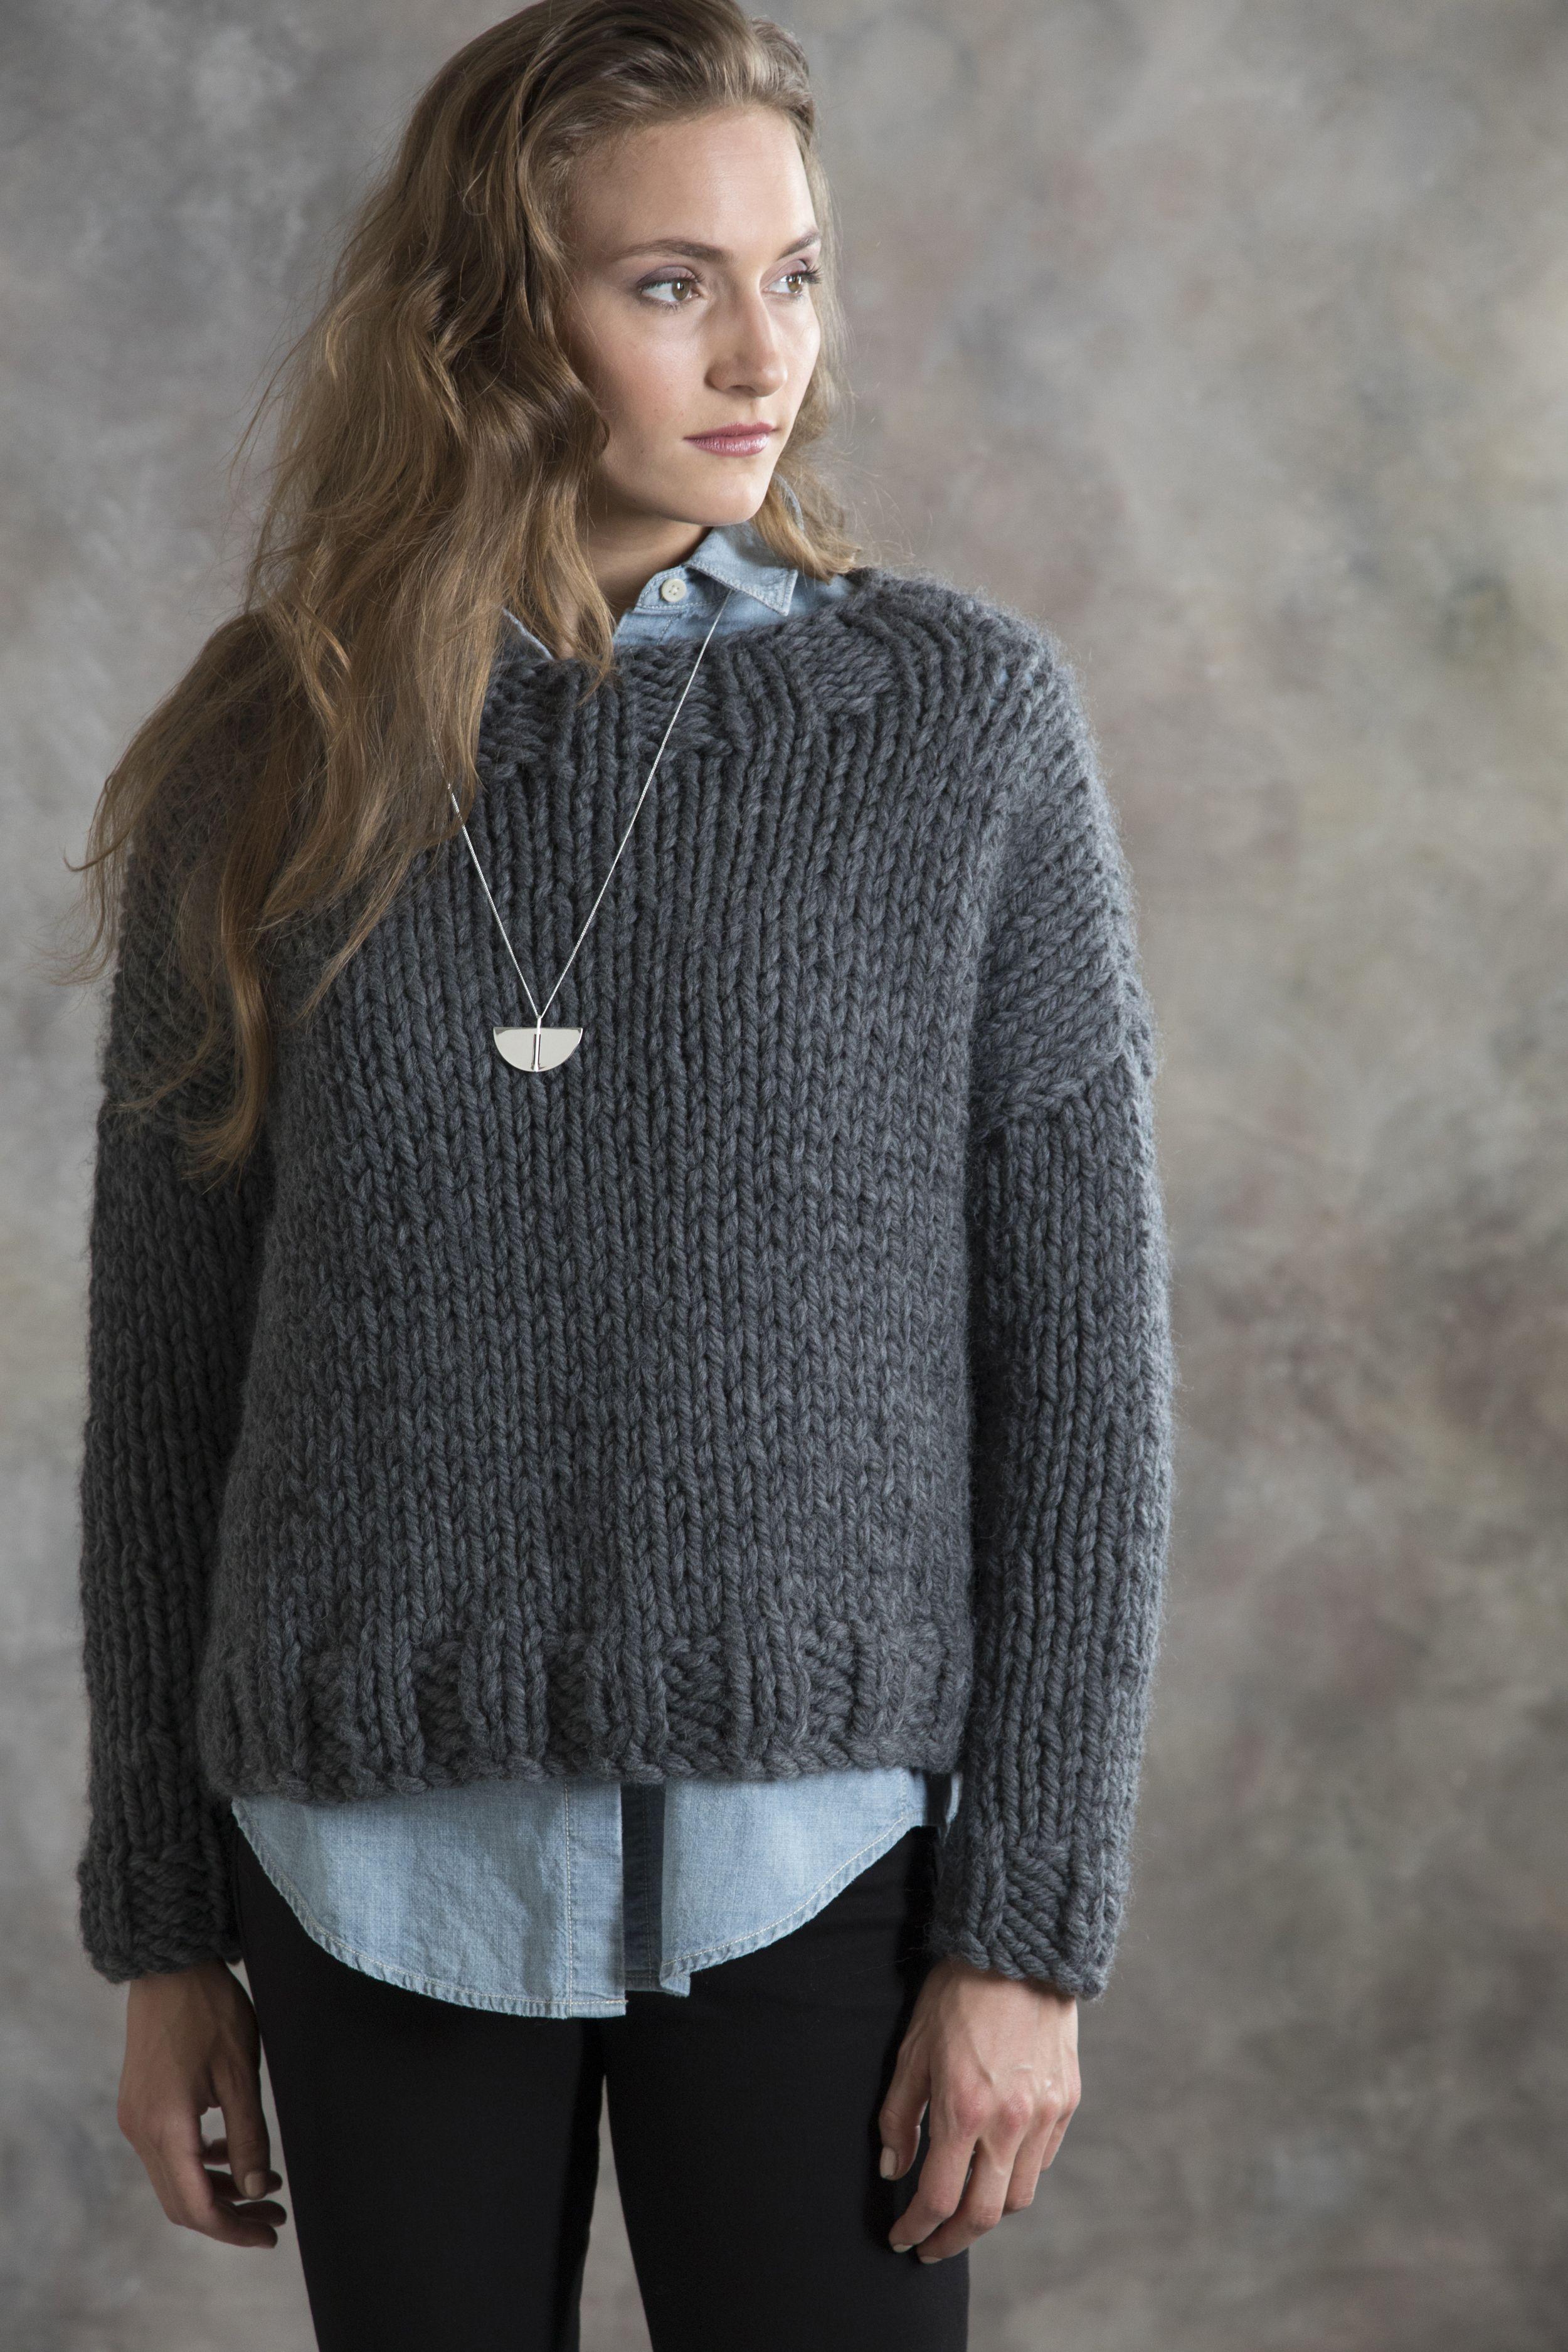 knit.wear Wool Studio Presents: Tahki Yarns Terra Collection Digital ...